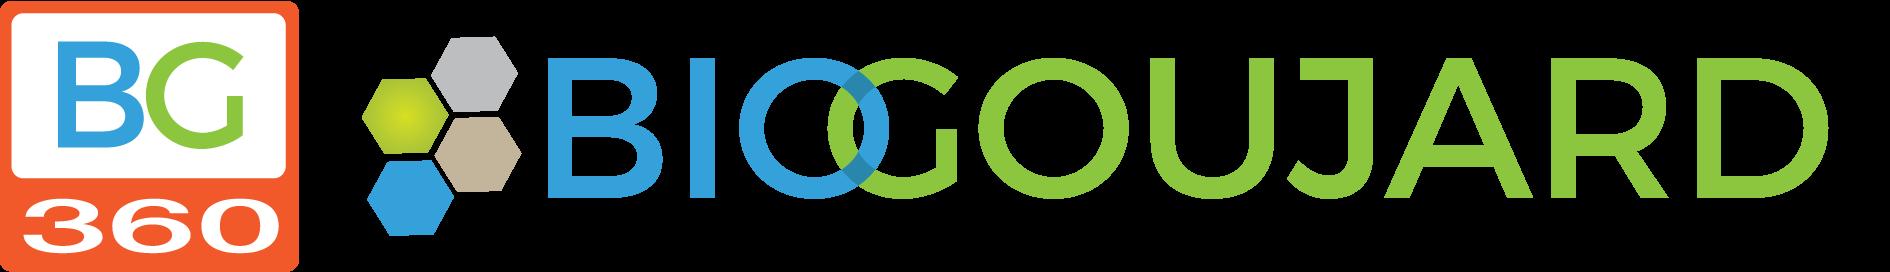 Biogoujard BG360